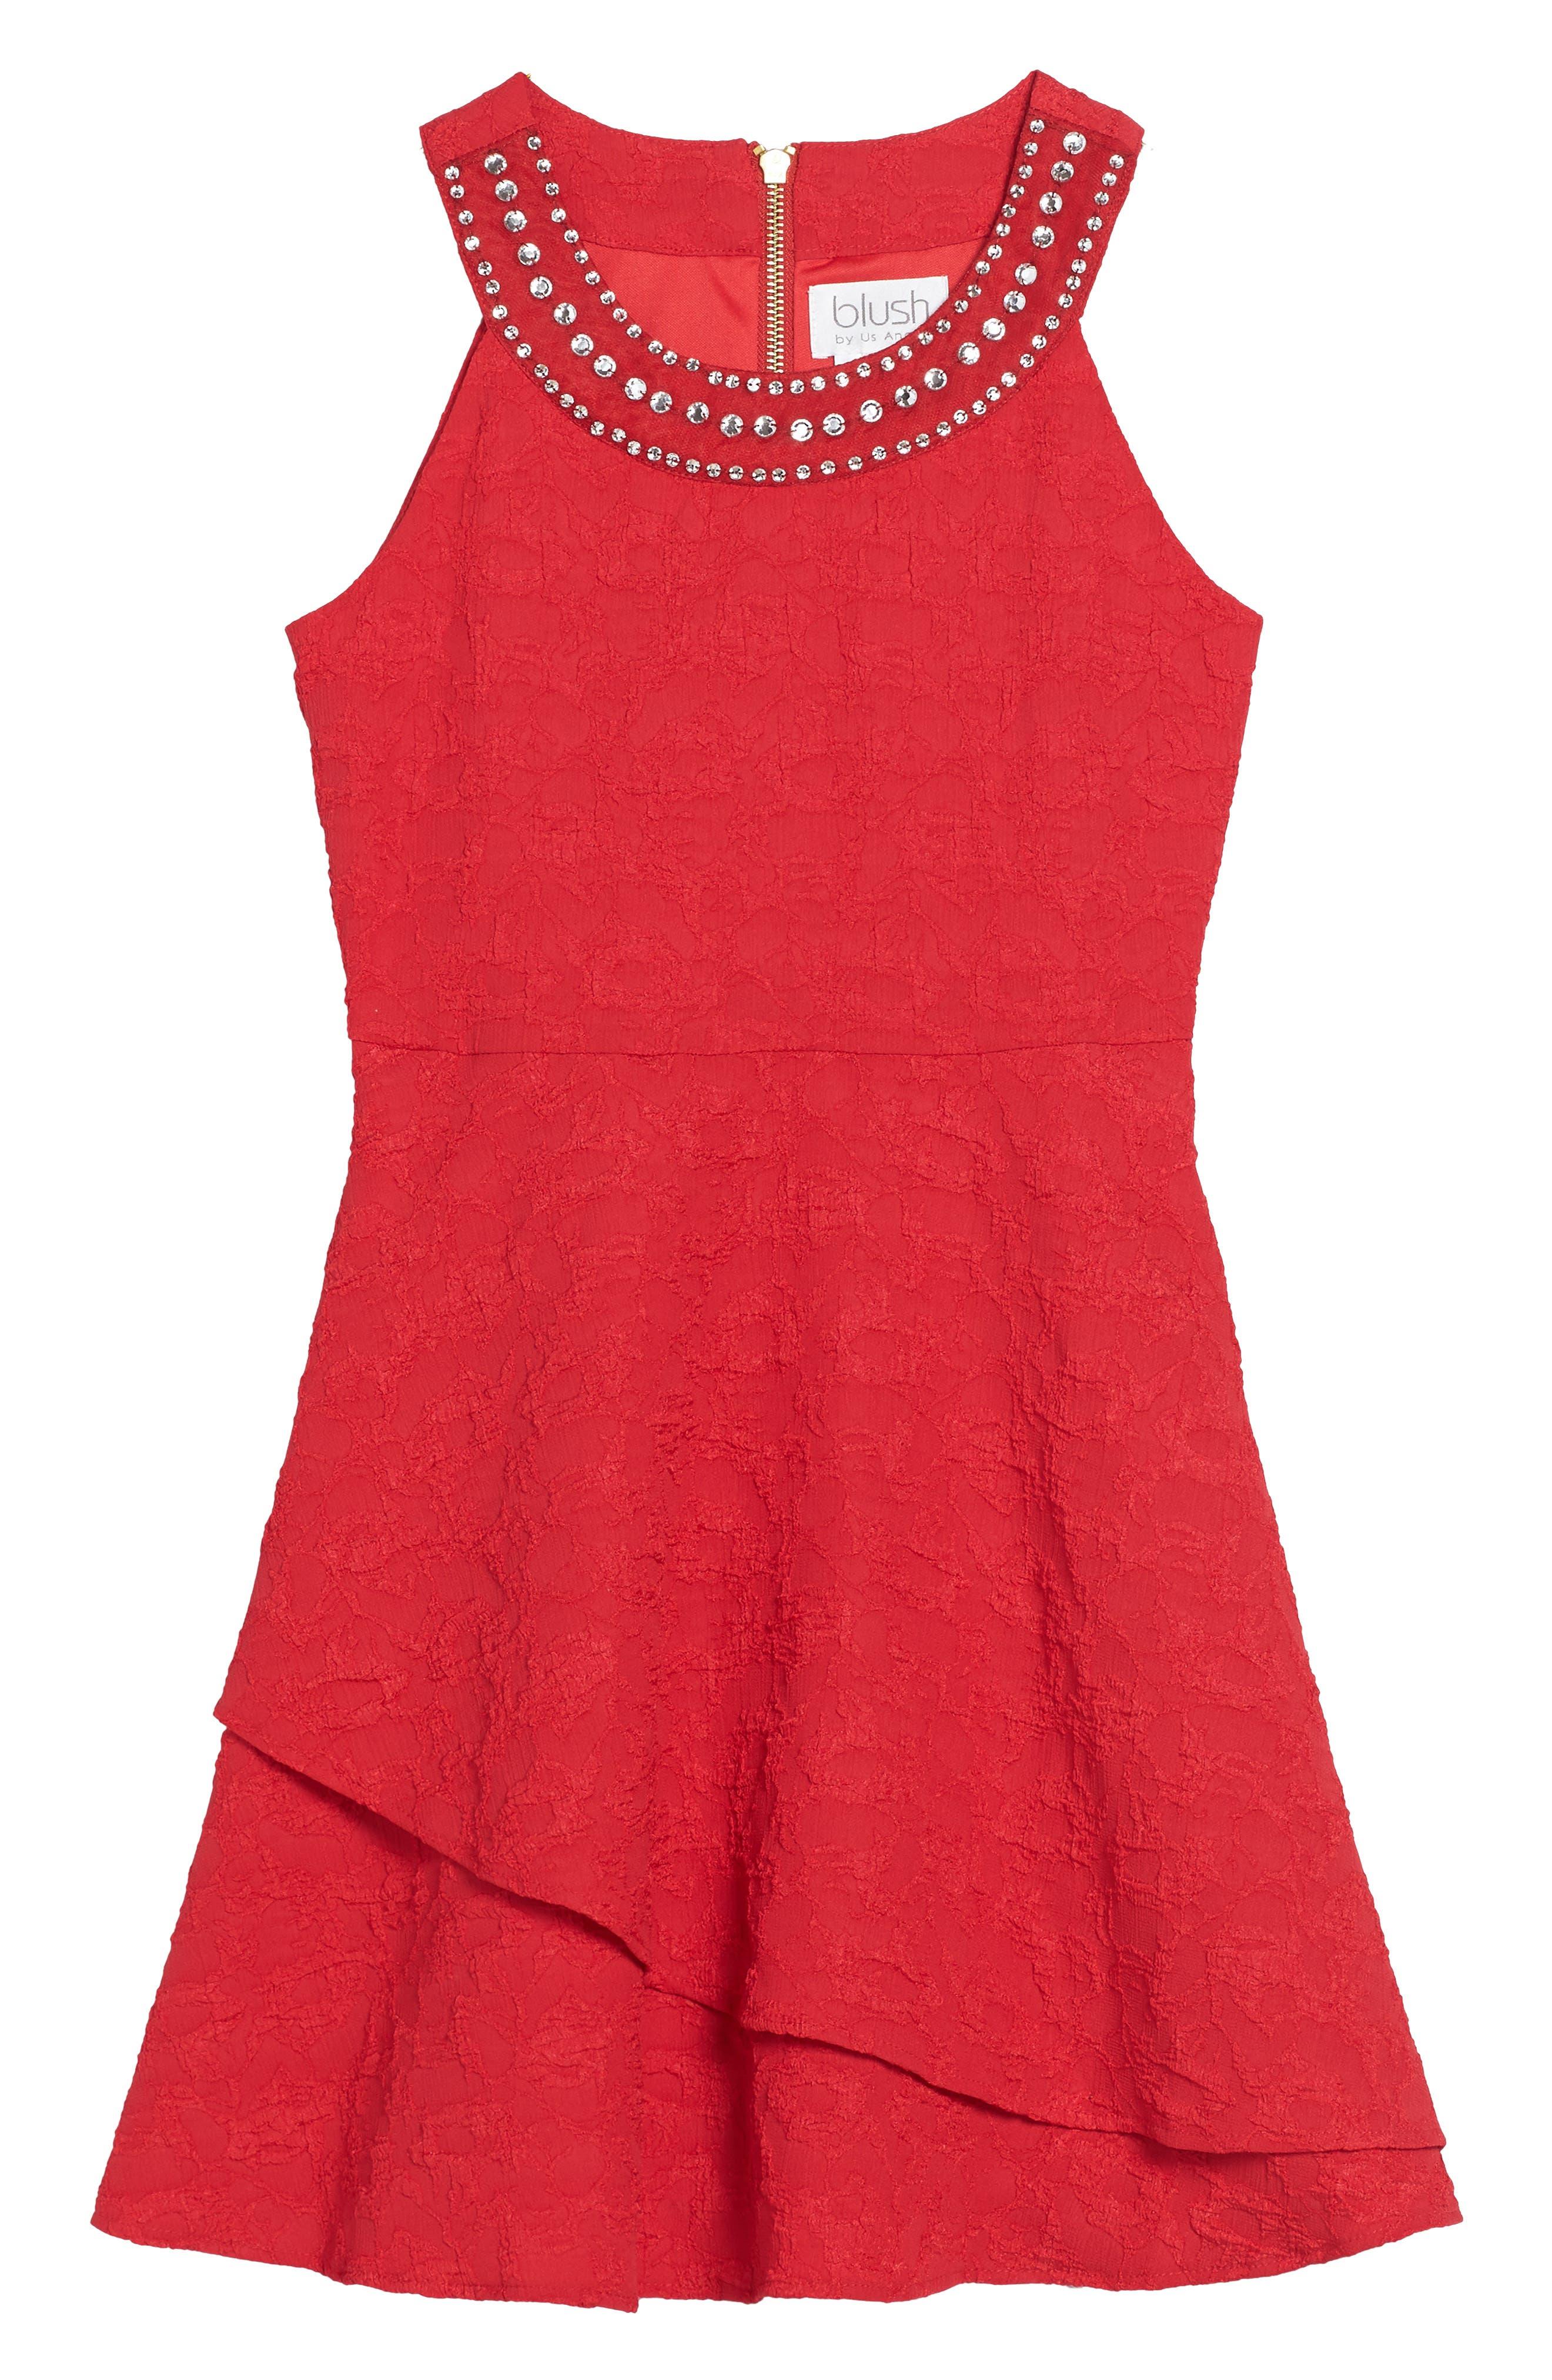 BLUSH by Us Angels Jewel Neck Fit & Flare Dress (Big Girls)